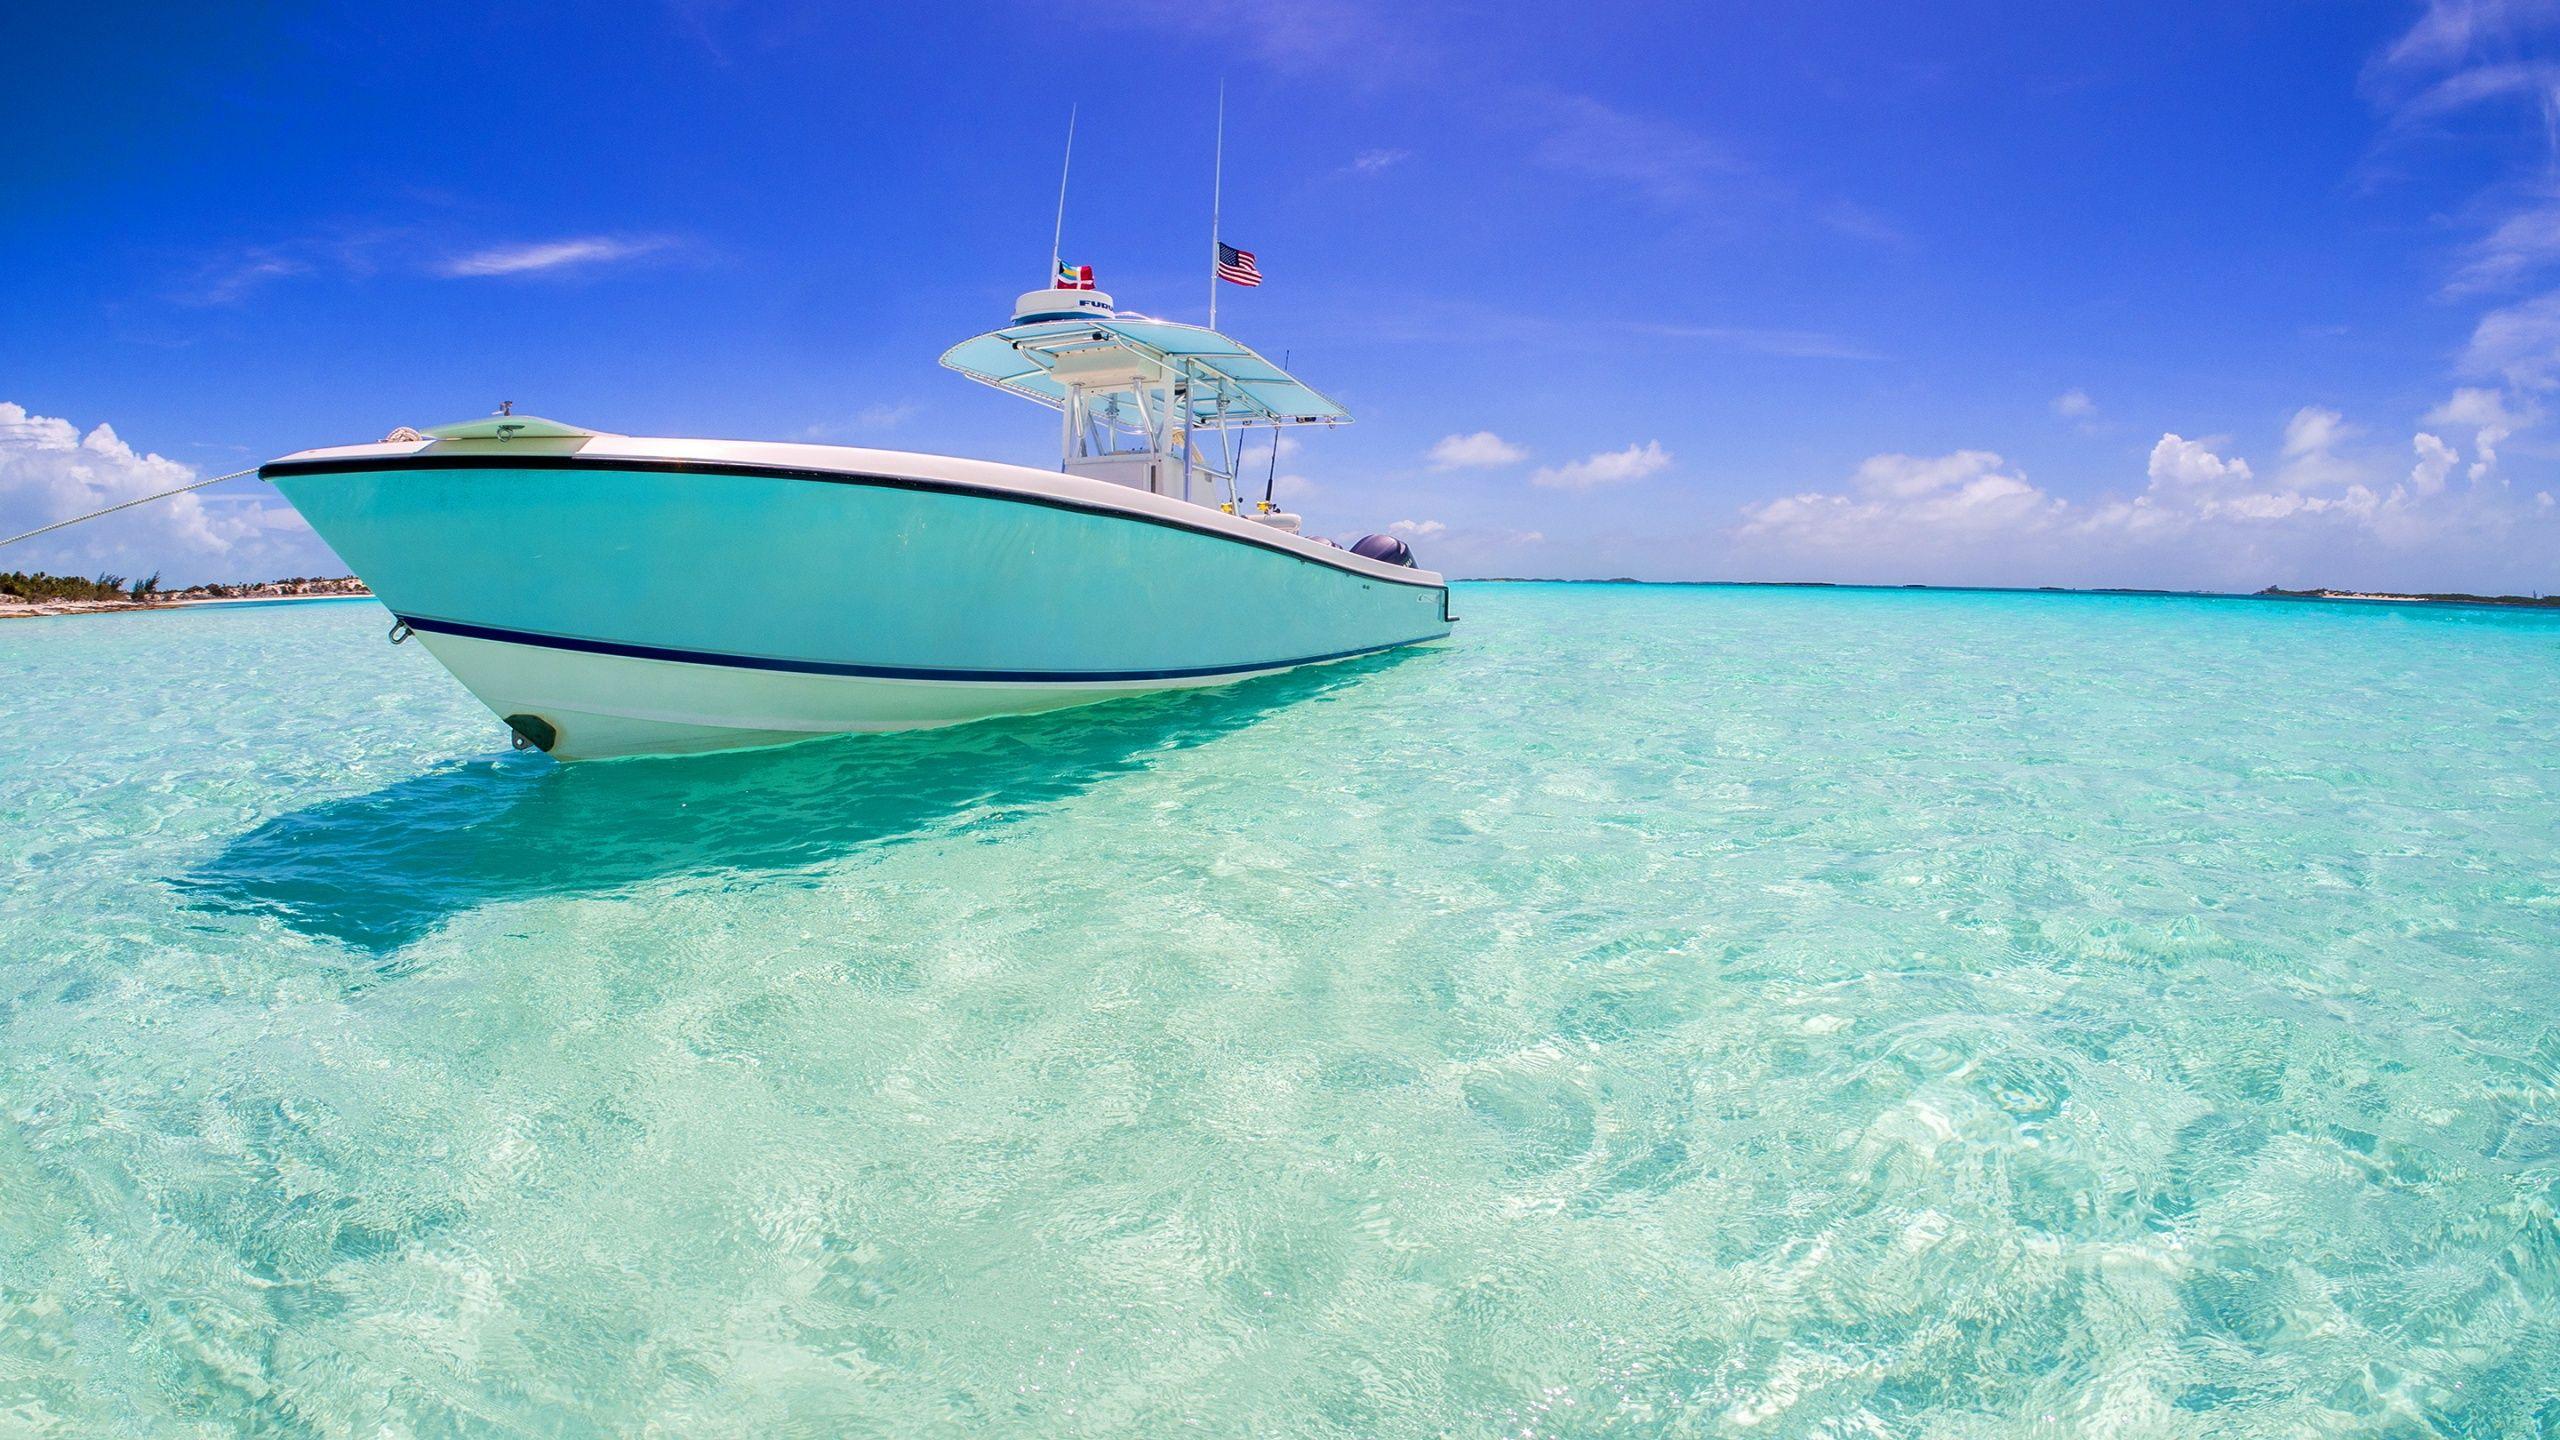 boat clear water wallpapers sky cloud ocean. | ocean | pinterest